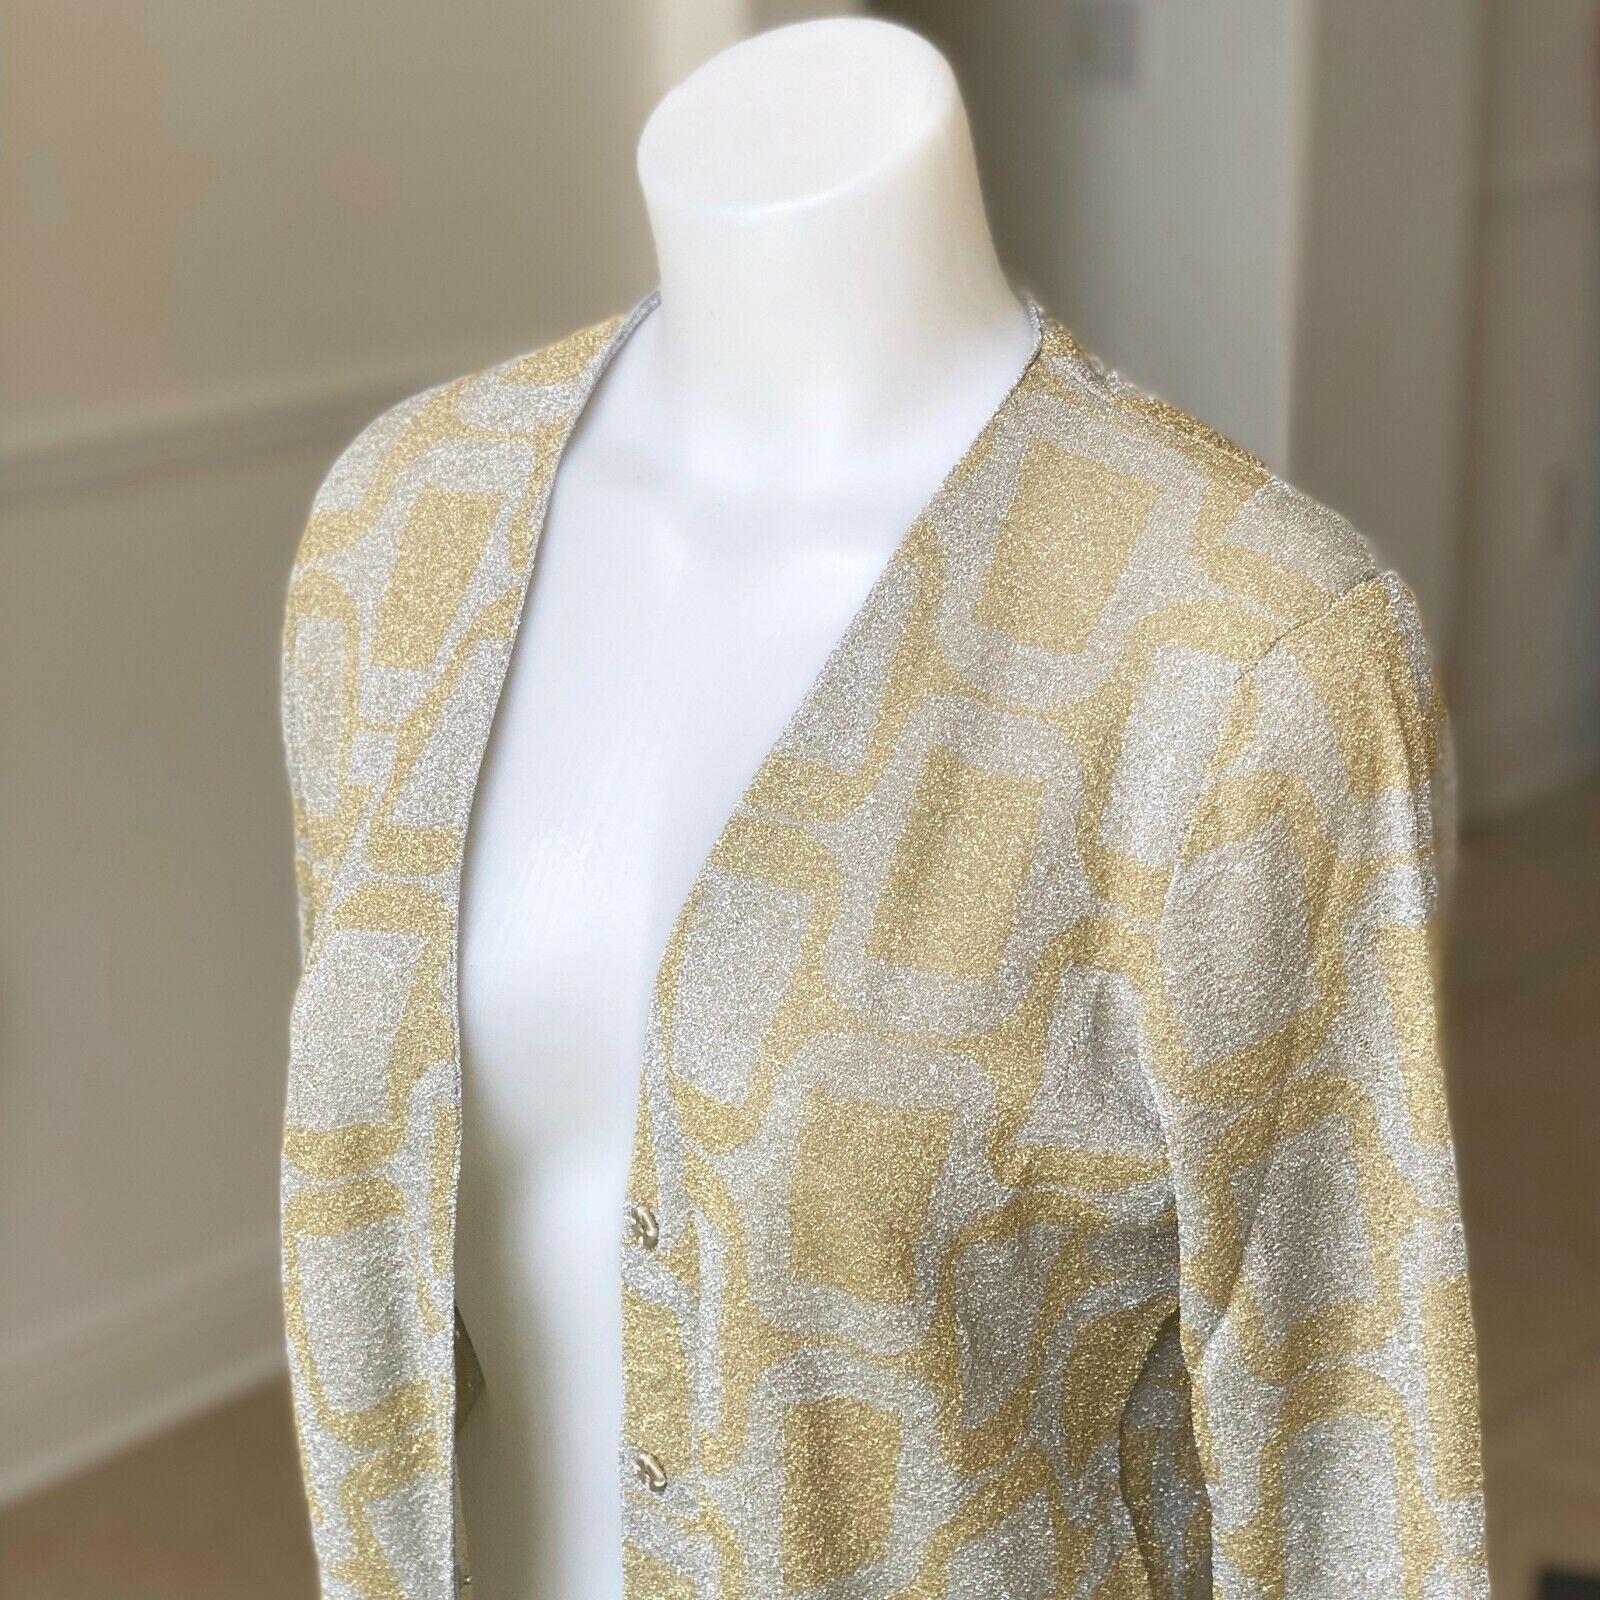 ea6eaae461081e JACOBS Silber & Gold lurex cardigan damen sweater Größe Italian M Nwt MARC  nprnzp396-neue Kleidung